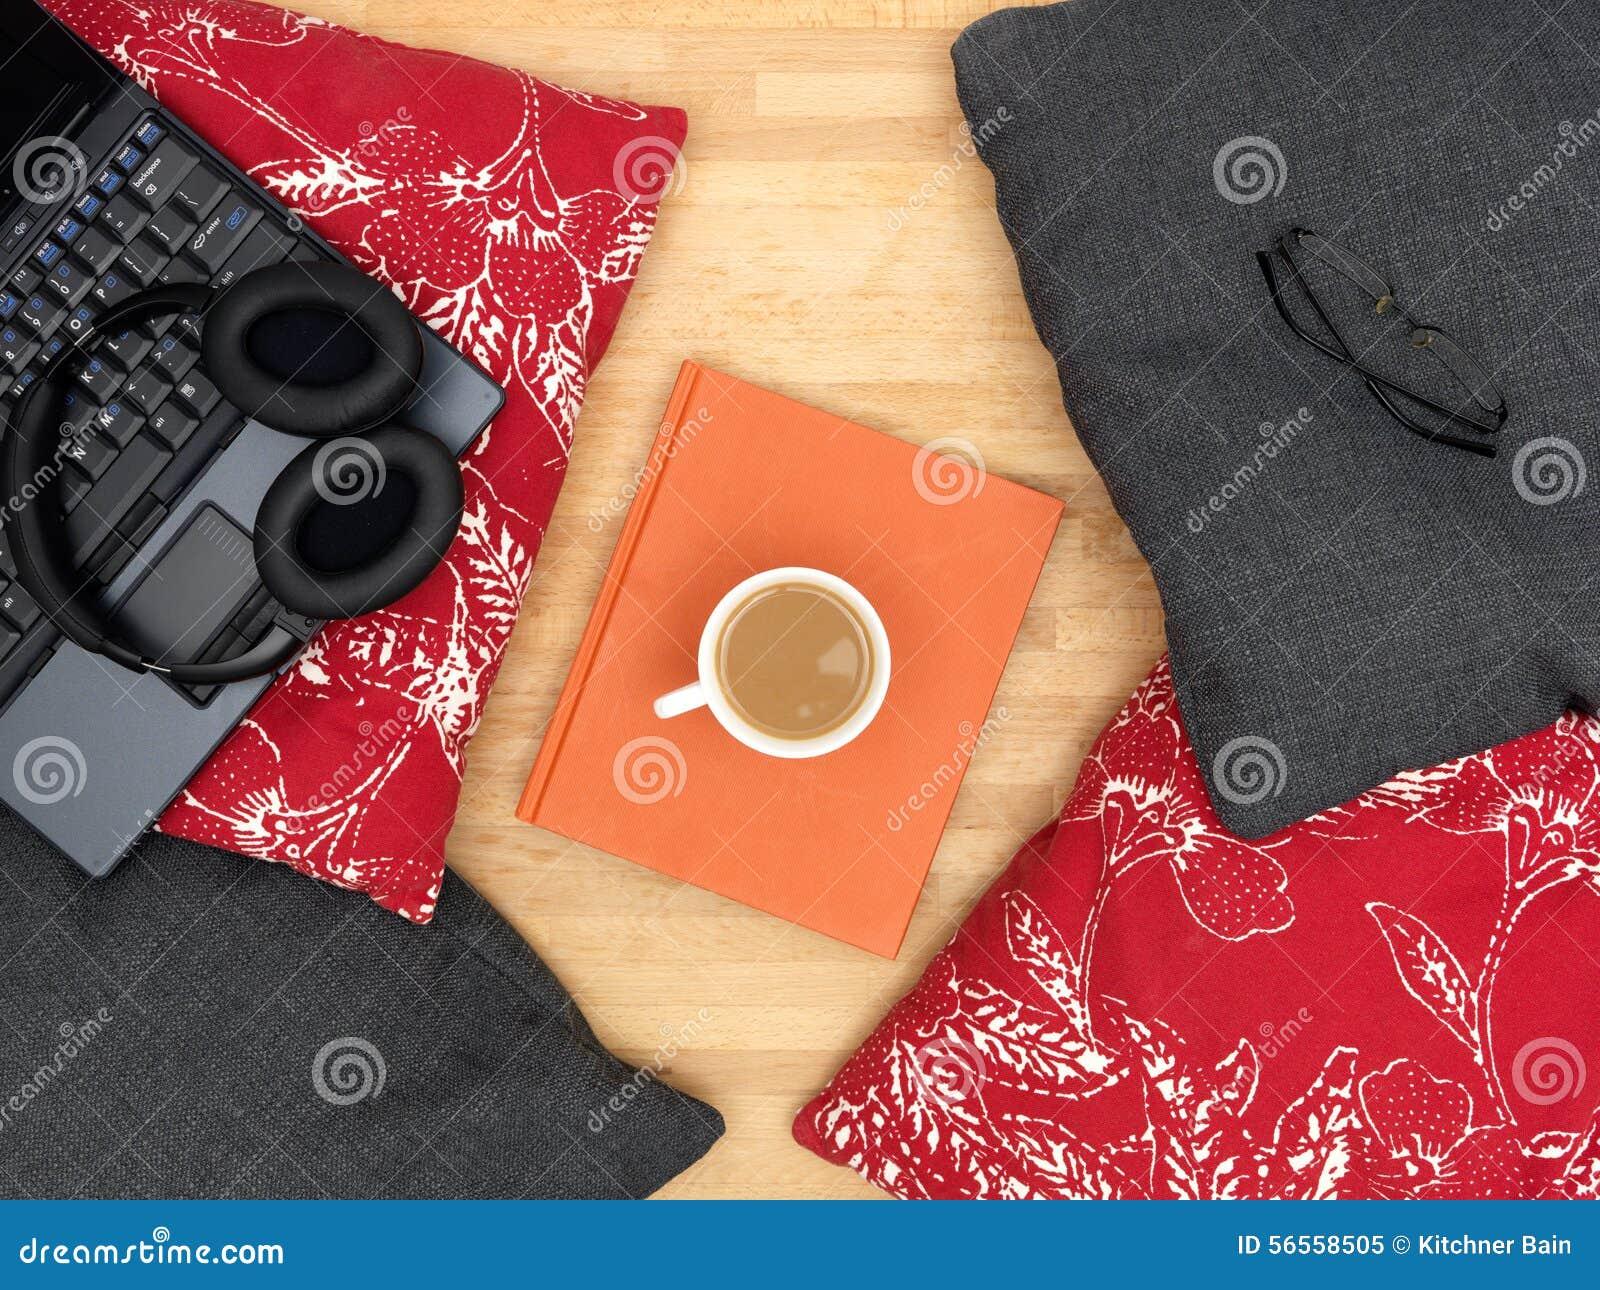 Download Μαξιλάρια καναπέδων στοκ εικόνα. εικόνα από ύφασμα, κομψός - 56558505